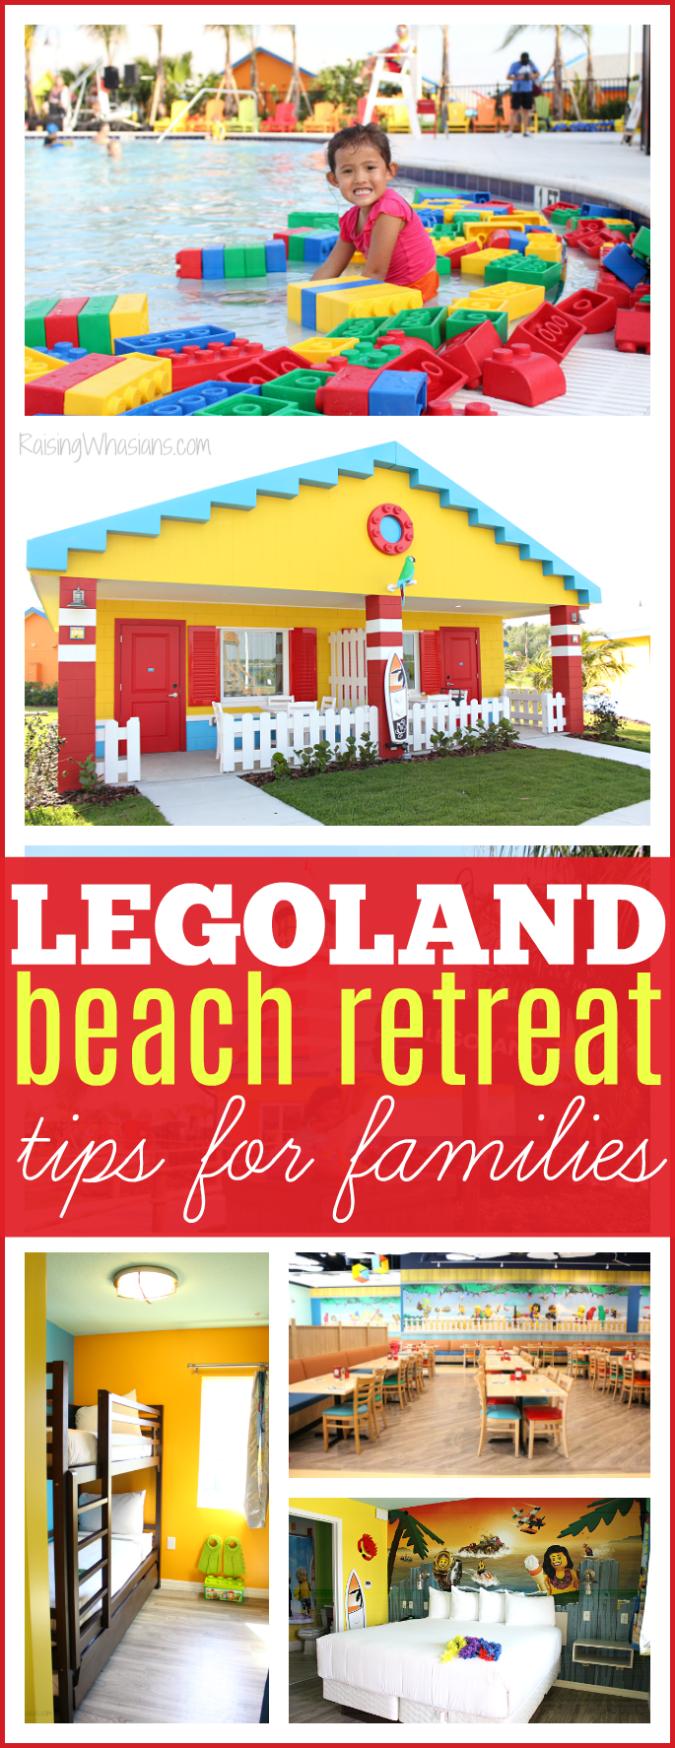 Legoland beach retreat tips pinterest